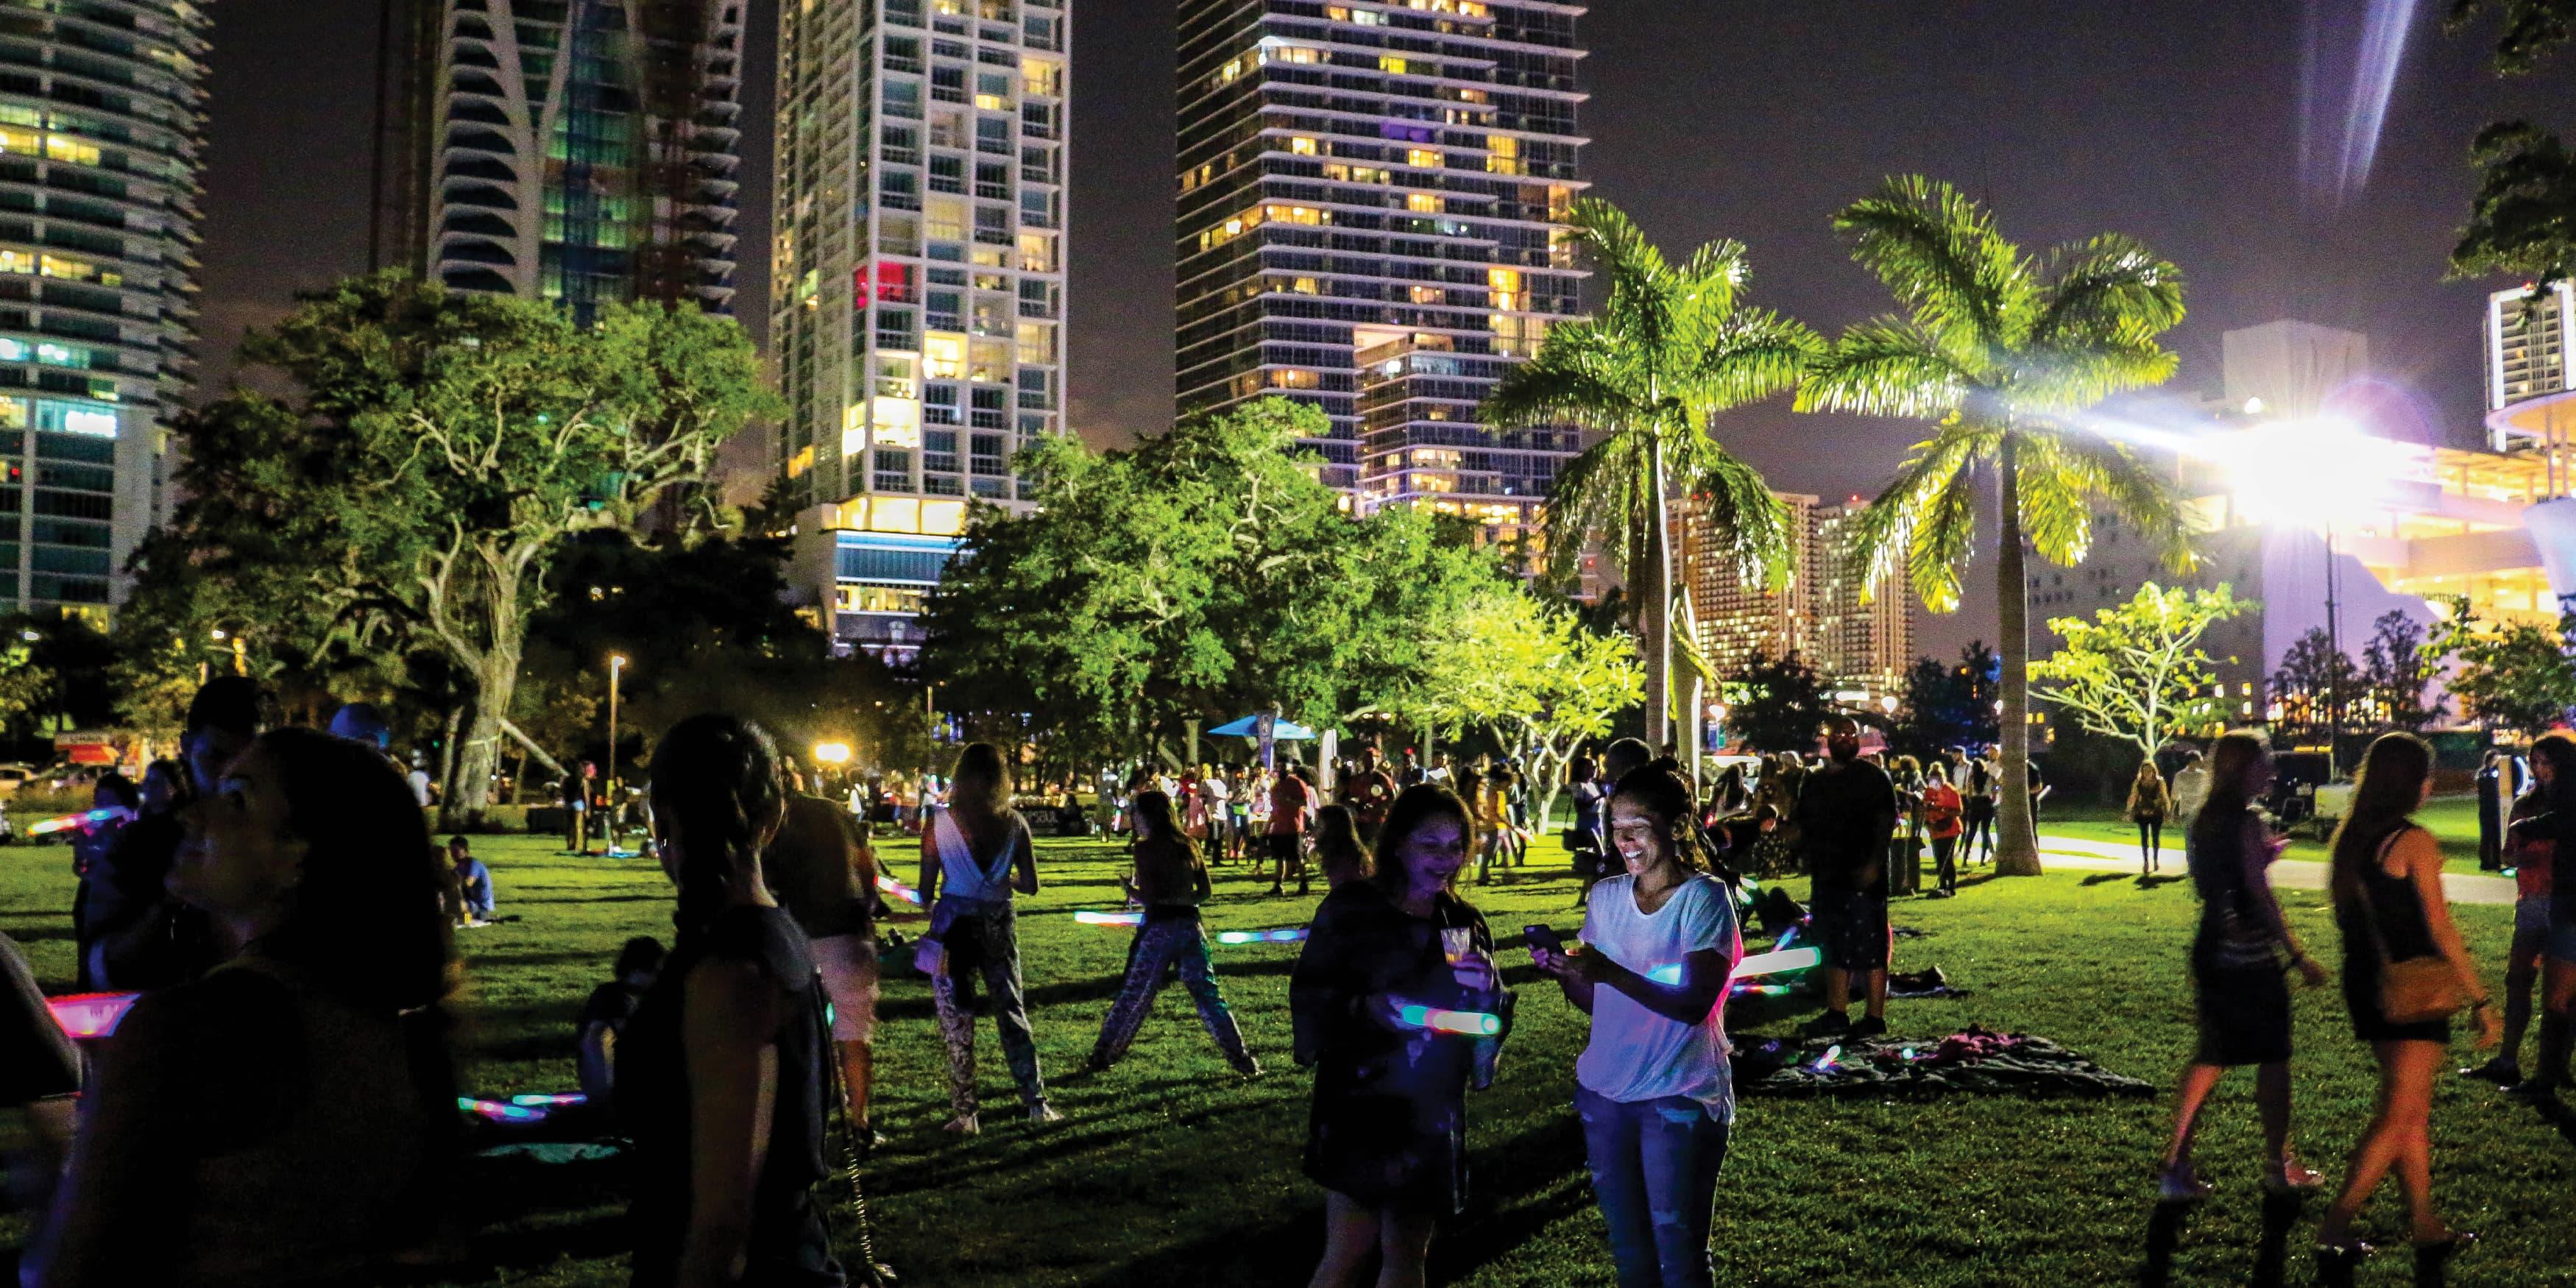 Miami, Florida social gathering